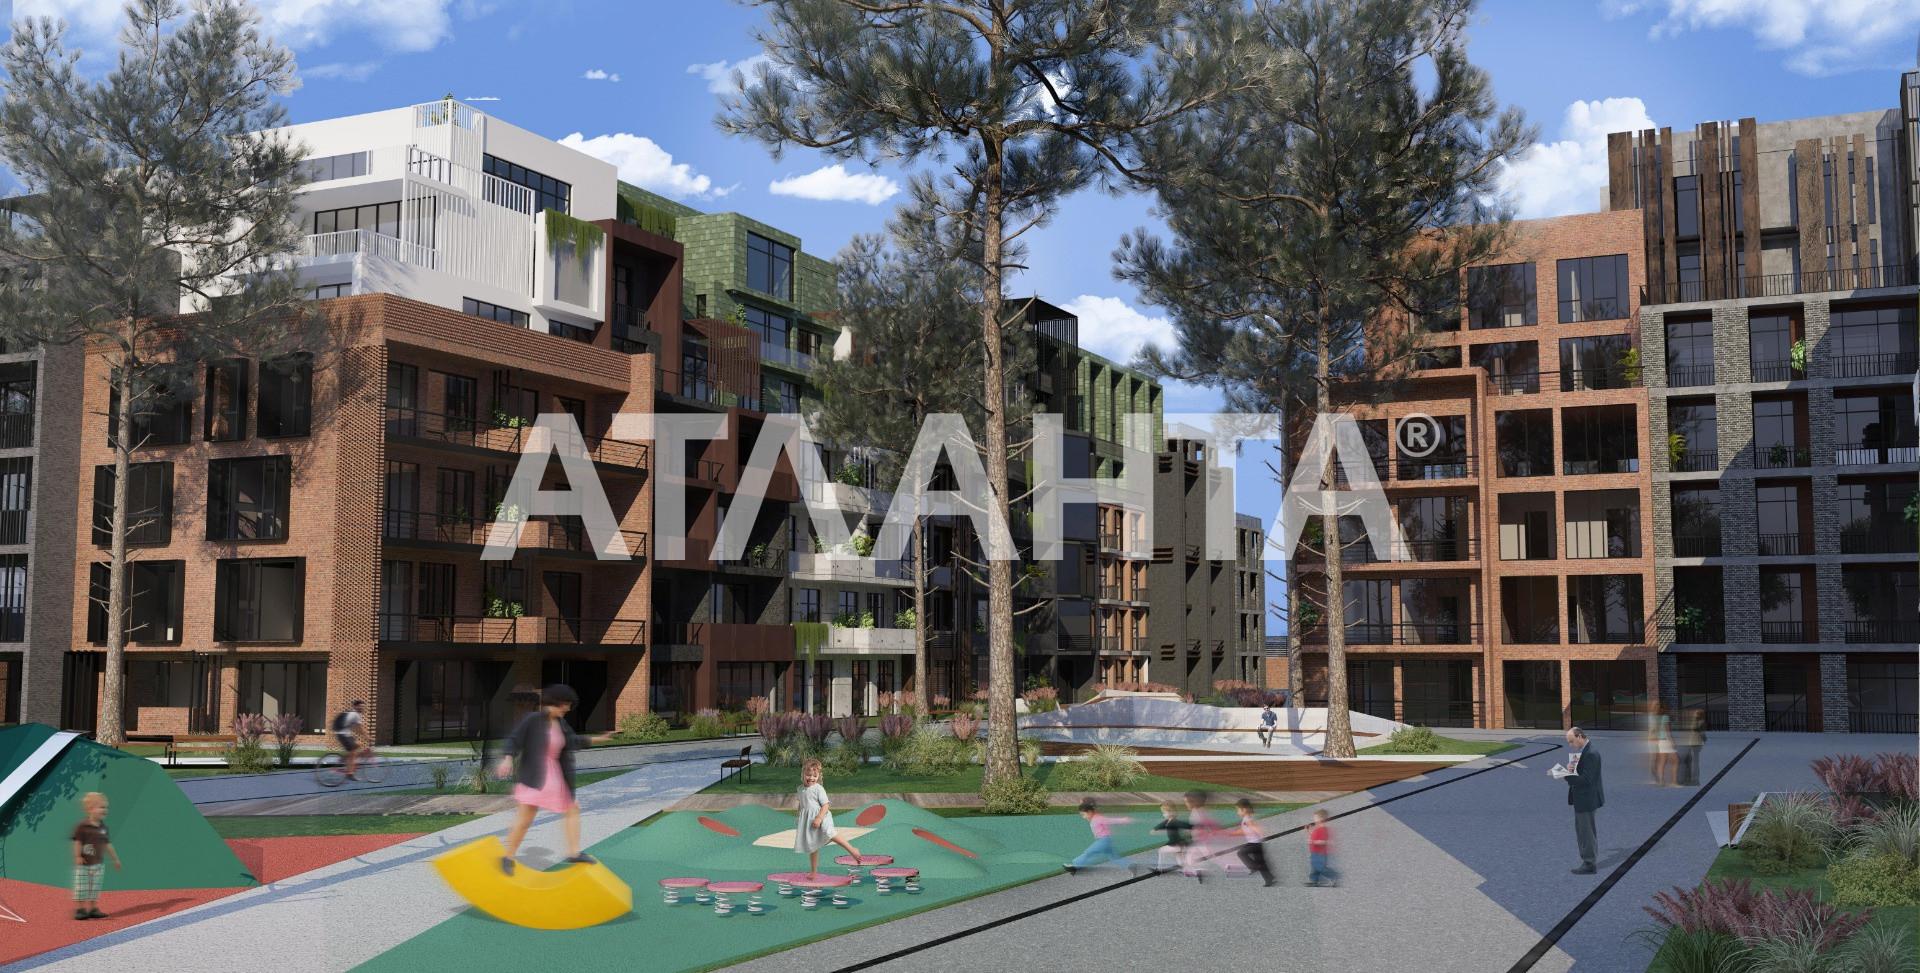 Продается 2-комнатная Квартира на ул. Донского Дмитрия — 75 790 у.е. (фото №3)